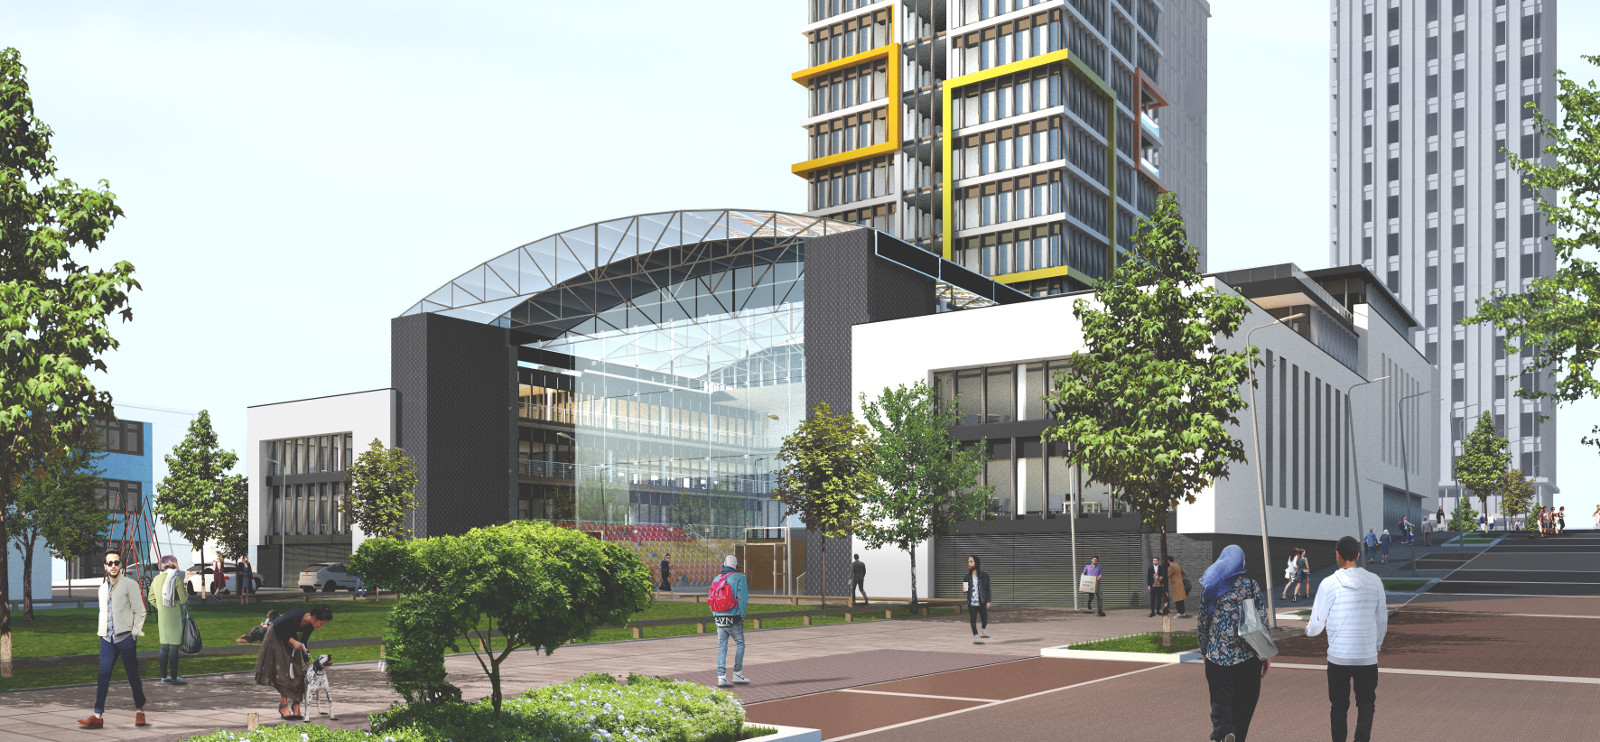 Boho X – A Major Step Towards Making Middlesbrough THE Digital City